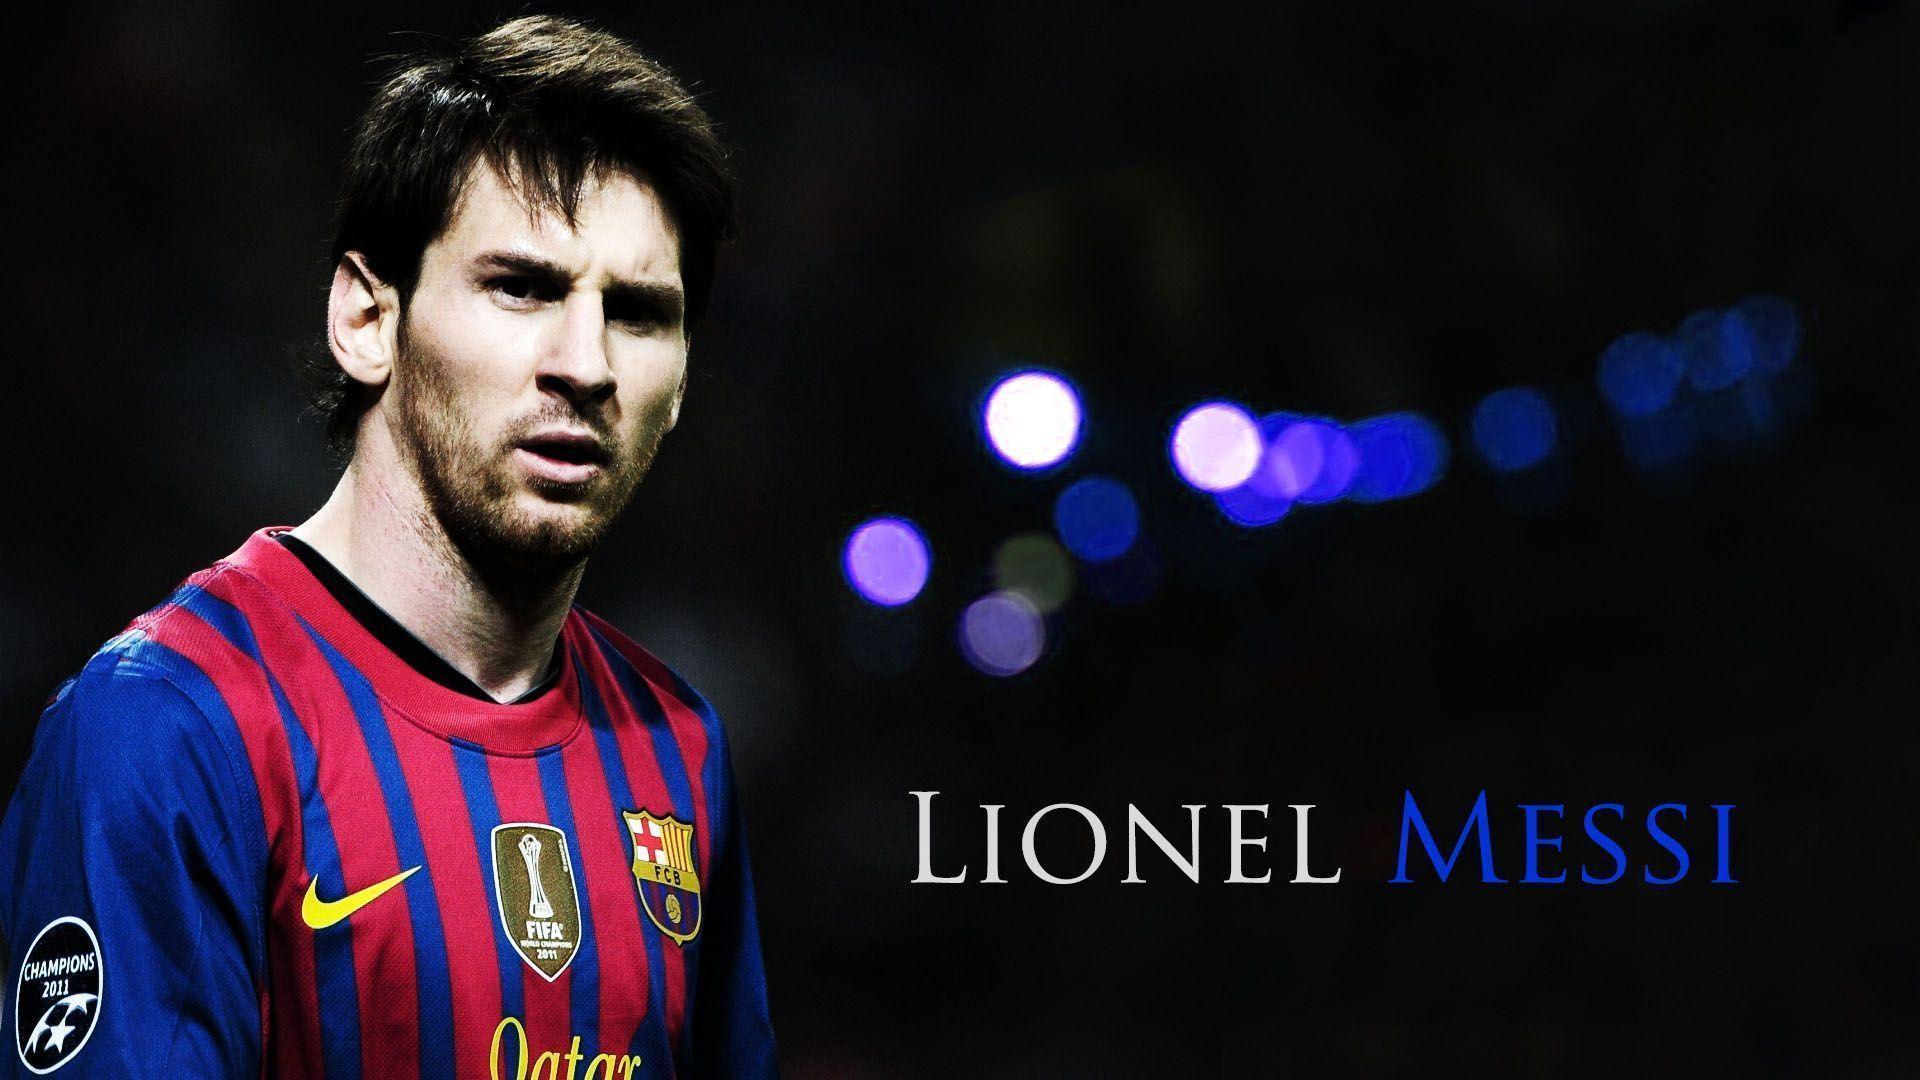 Leo Messi Wallpapers - Wallpaper Cave